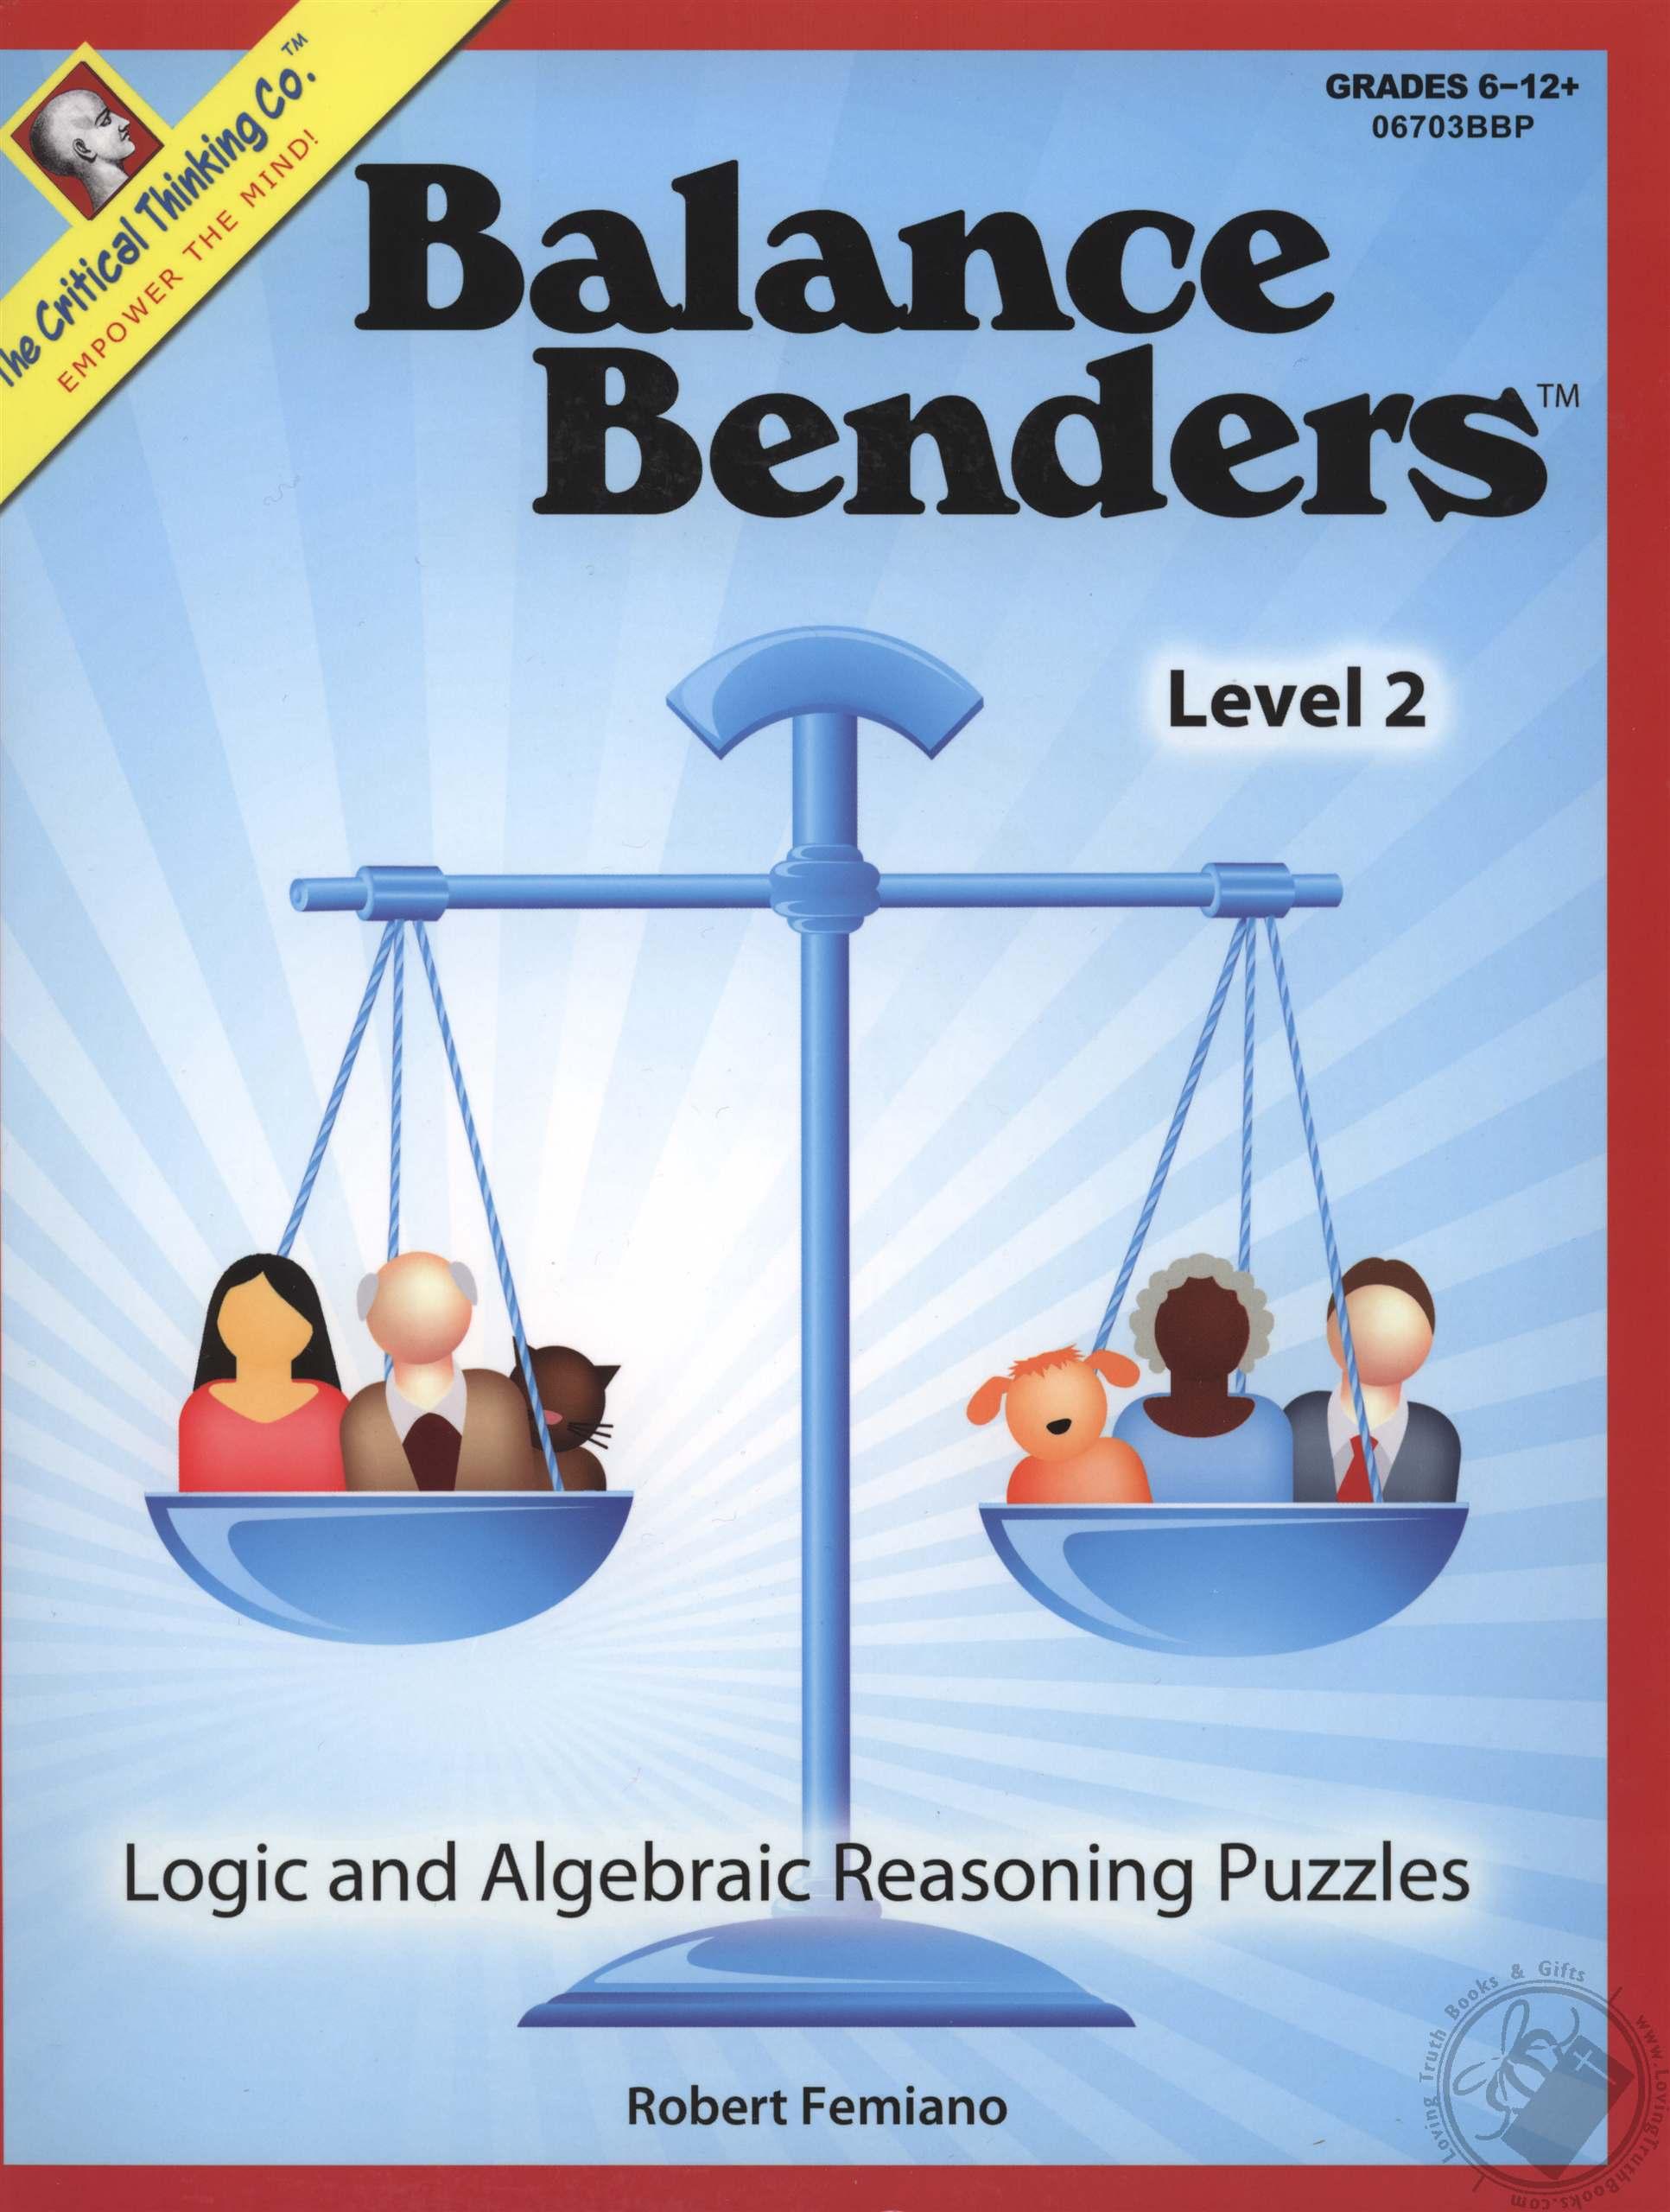 Balance Benders Level 2 Logic And Algebraic Reasoning